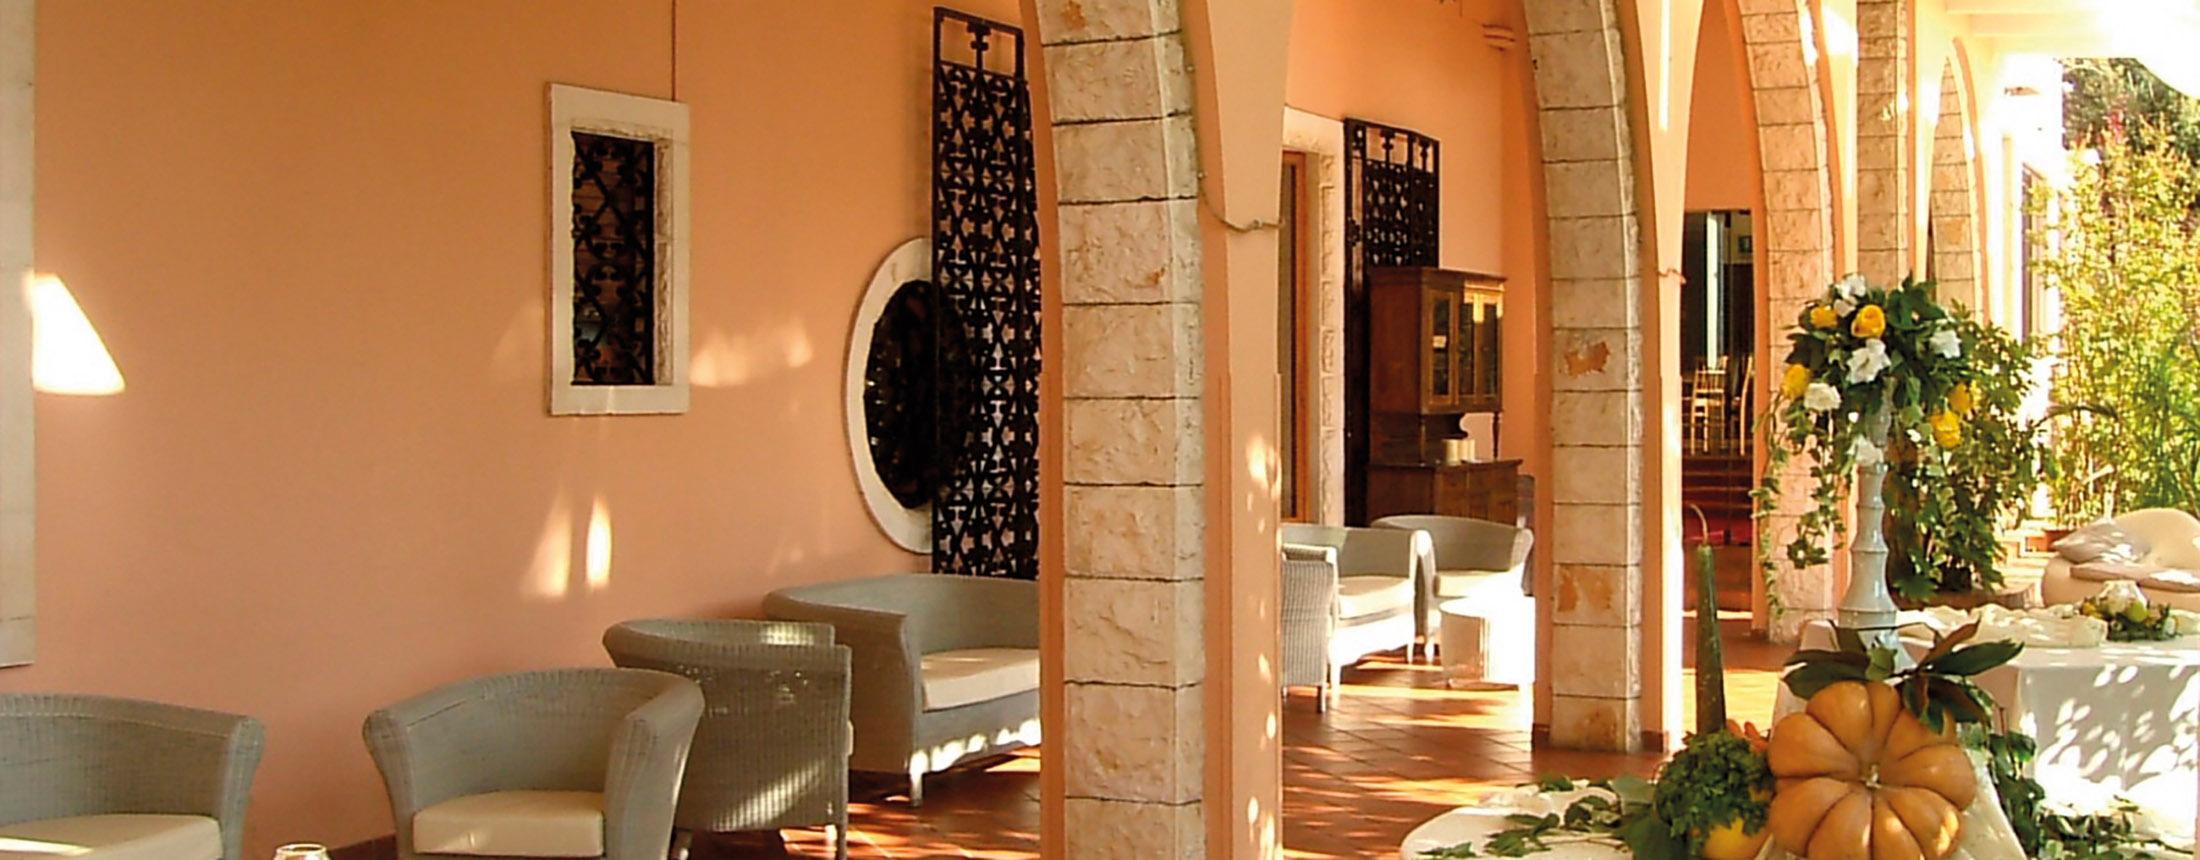 Park-Hotel-San-Michele-Porticato-Slider-1920x750